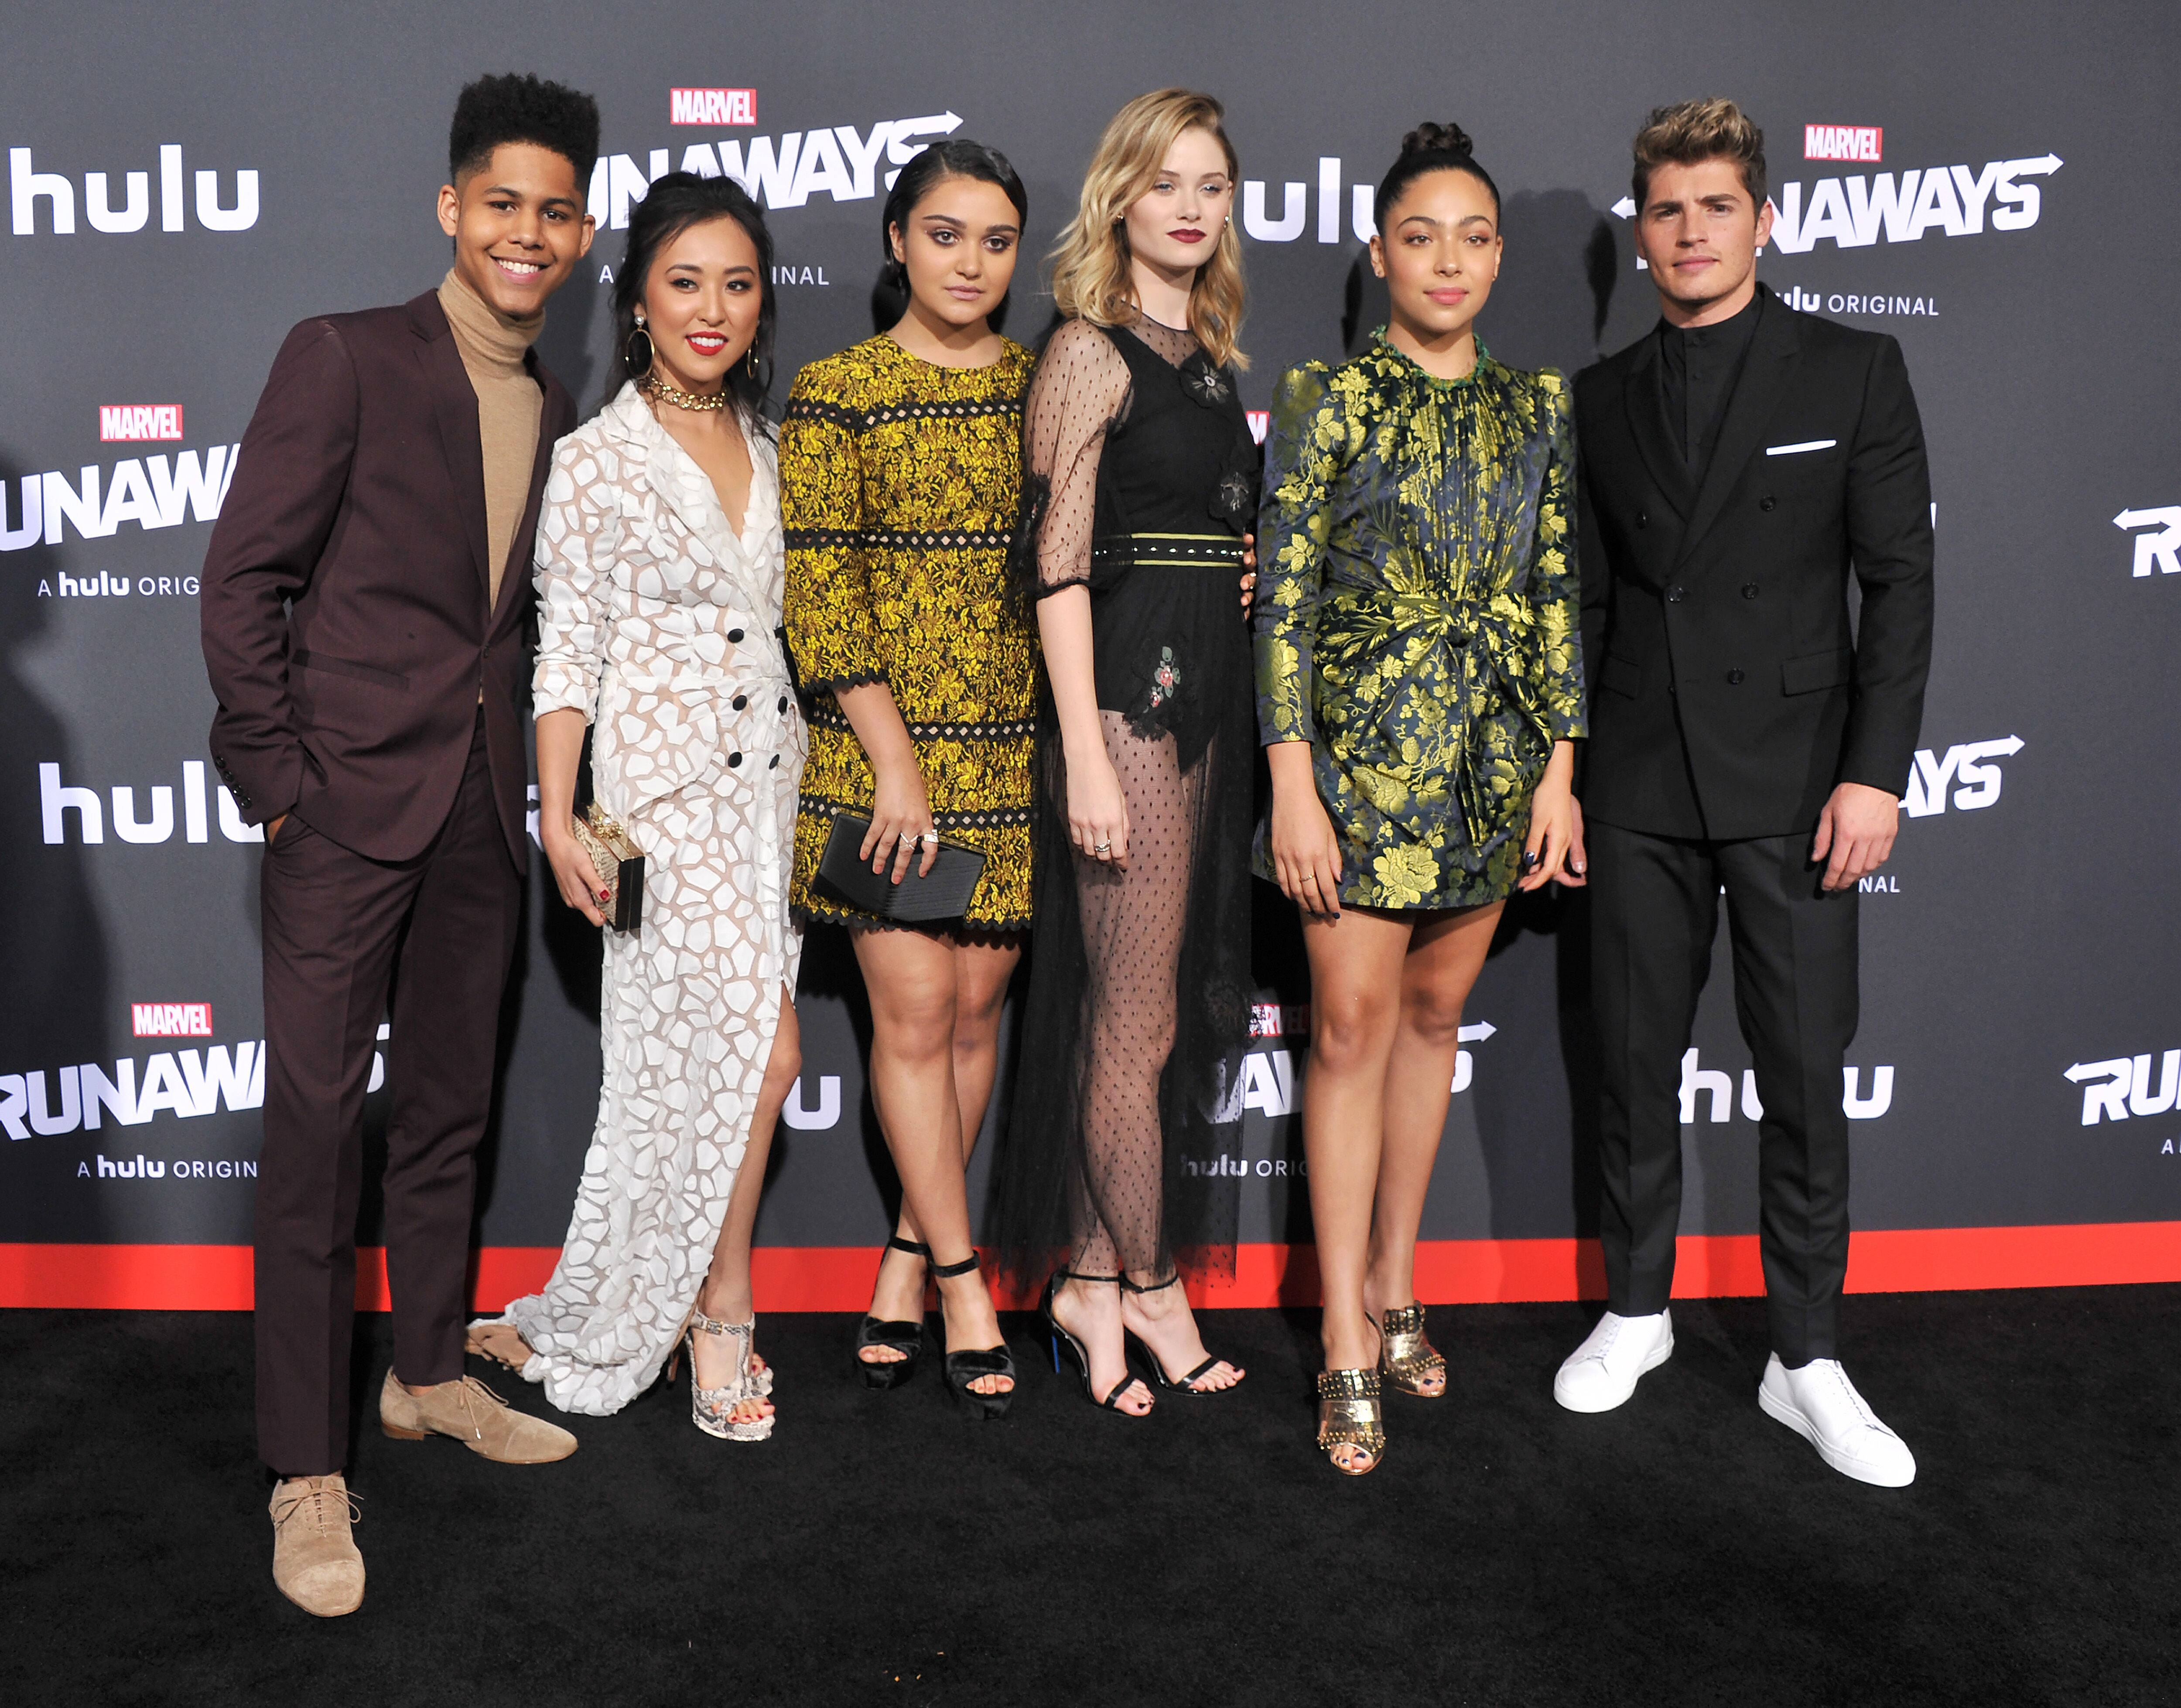 Marvel's Runaways renewed for a second season at Hulu